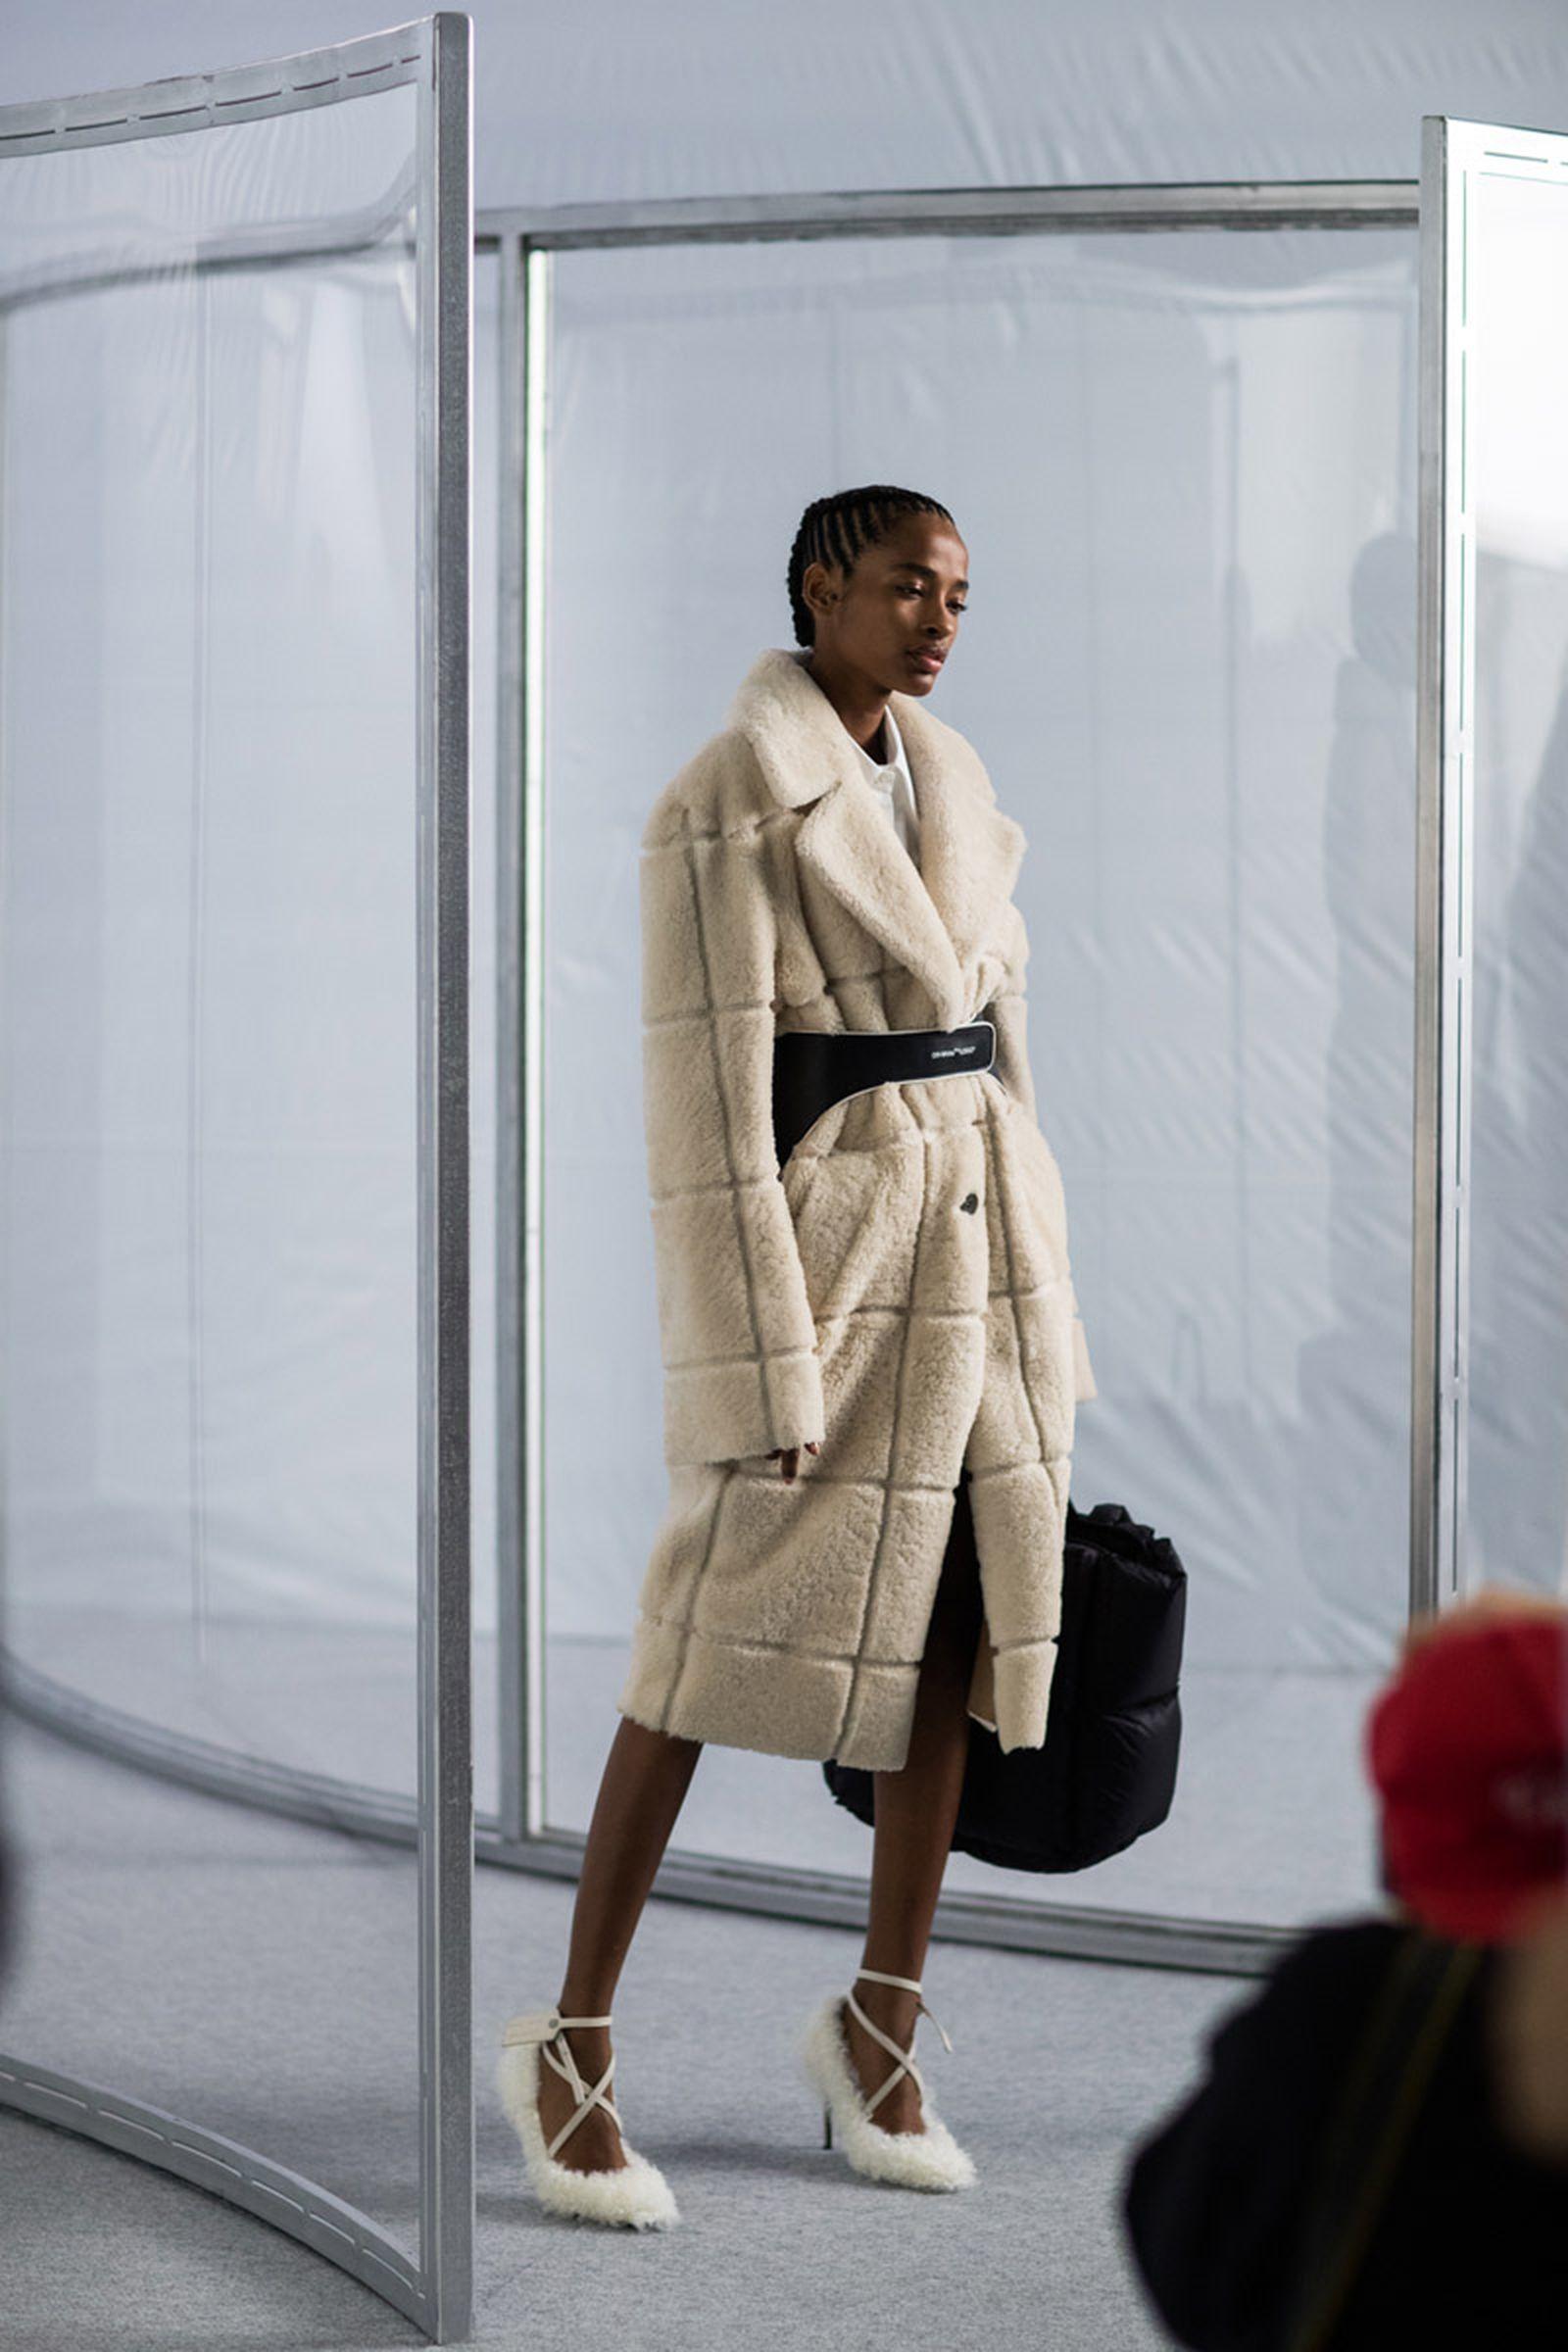 off white fw19 his hers pfw show OFF-WHITE c/o Virgil Abloh paris fashion week